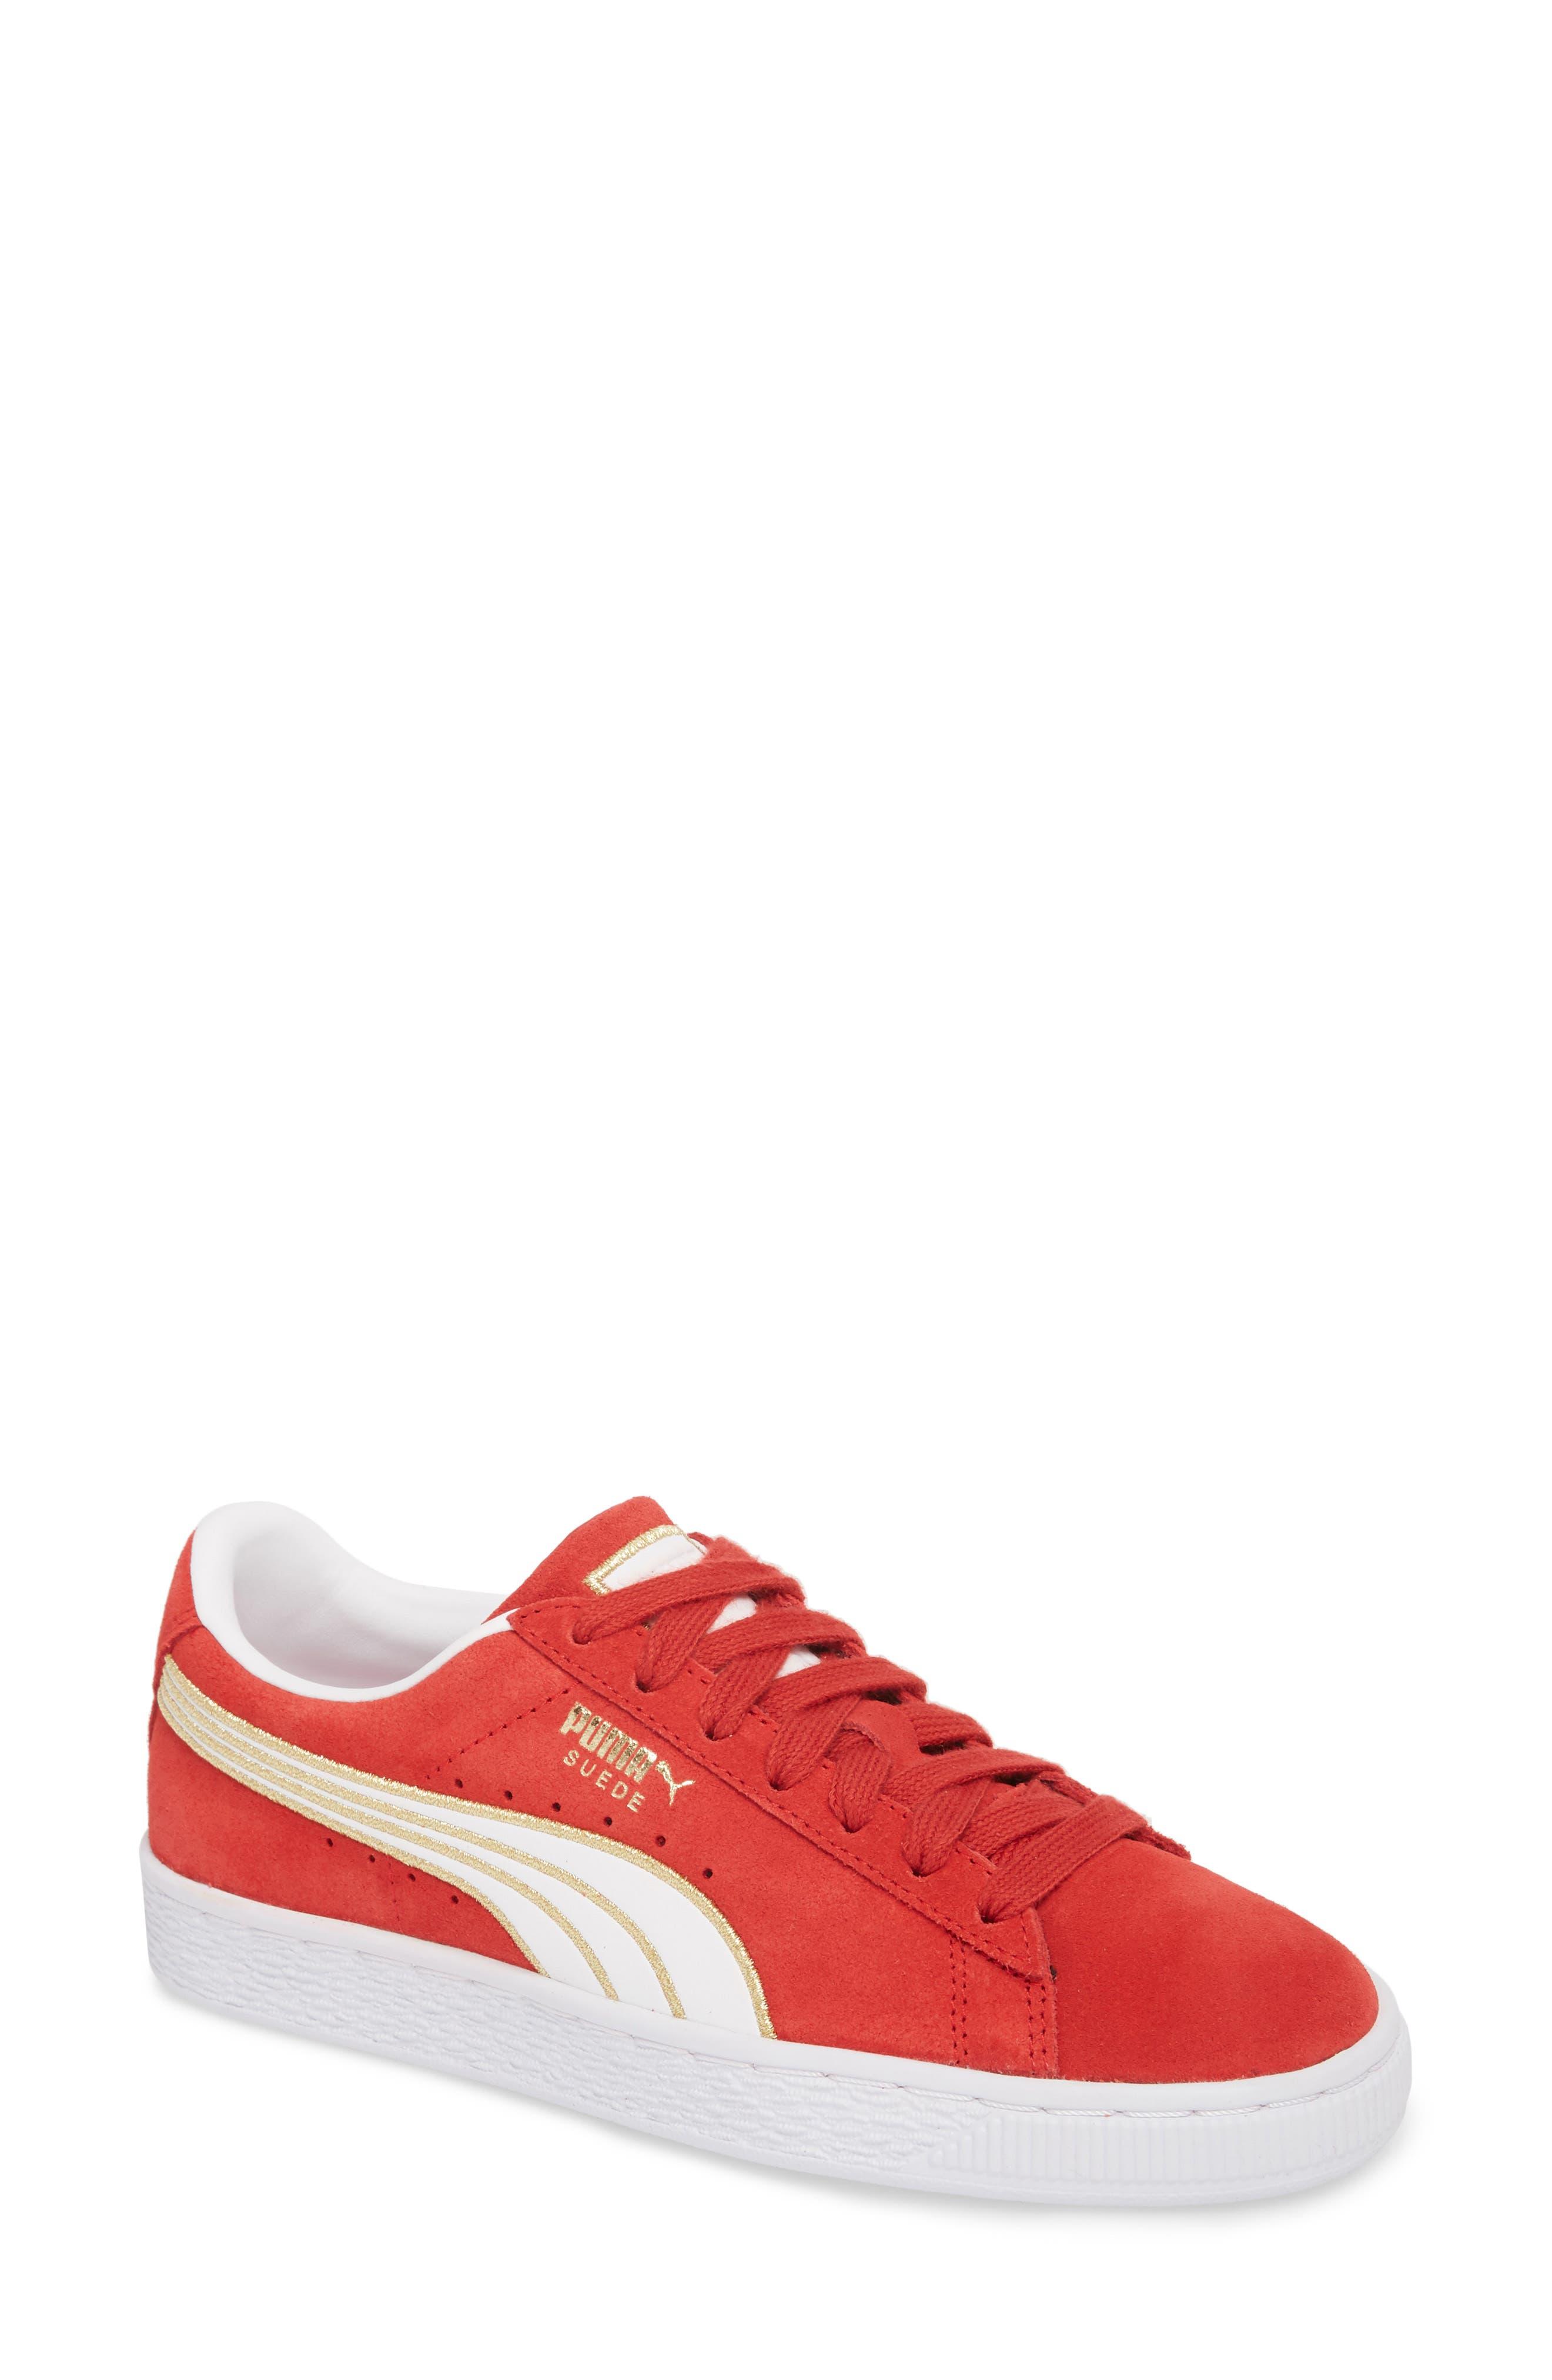 a4eba9d5508 red high top pumas Sale